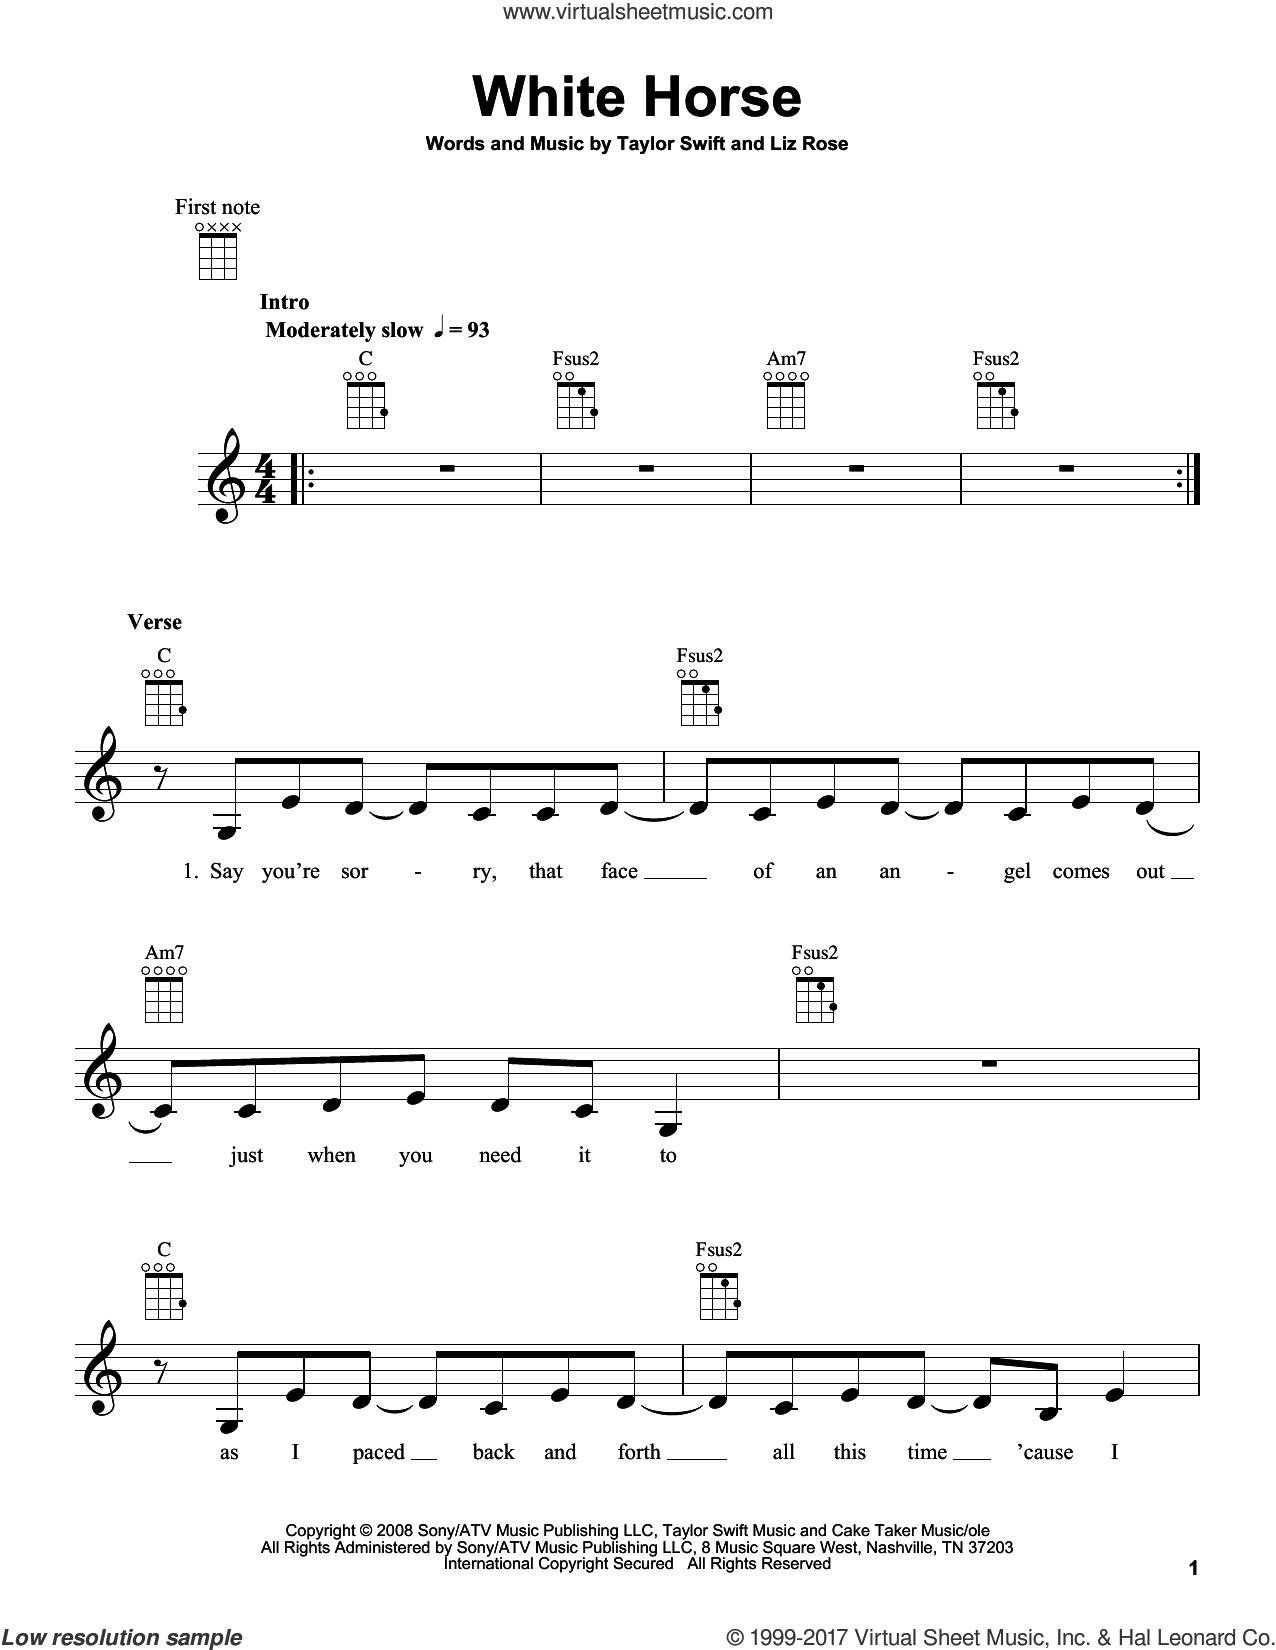 White Horse sheet music for ukulele by Taylor Swift and Liz Rose, intermediate skill level